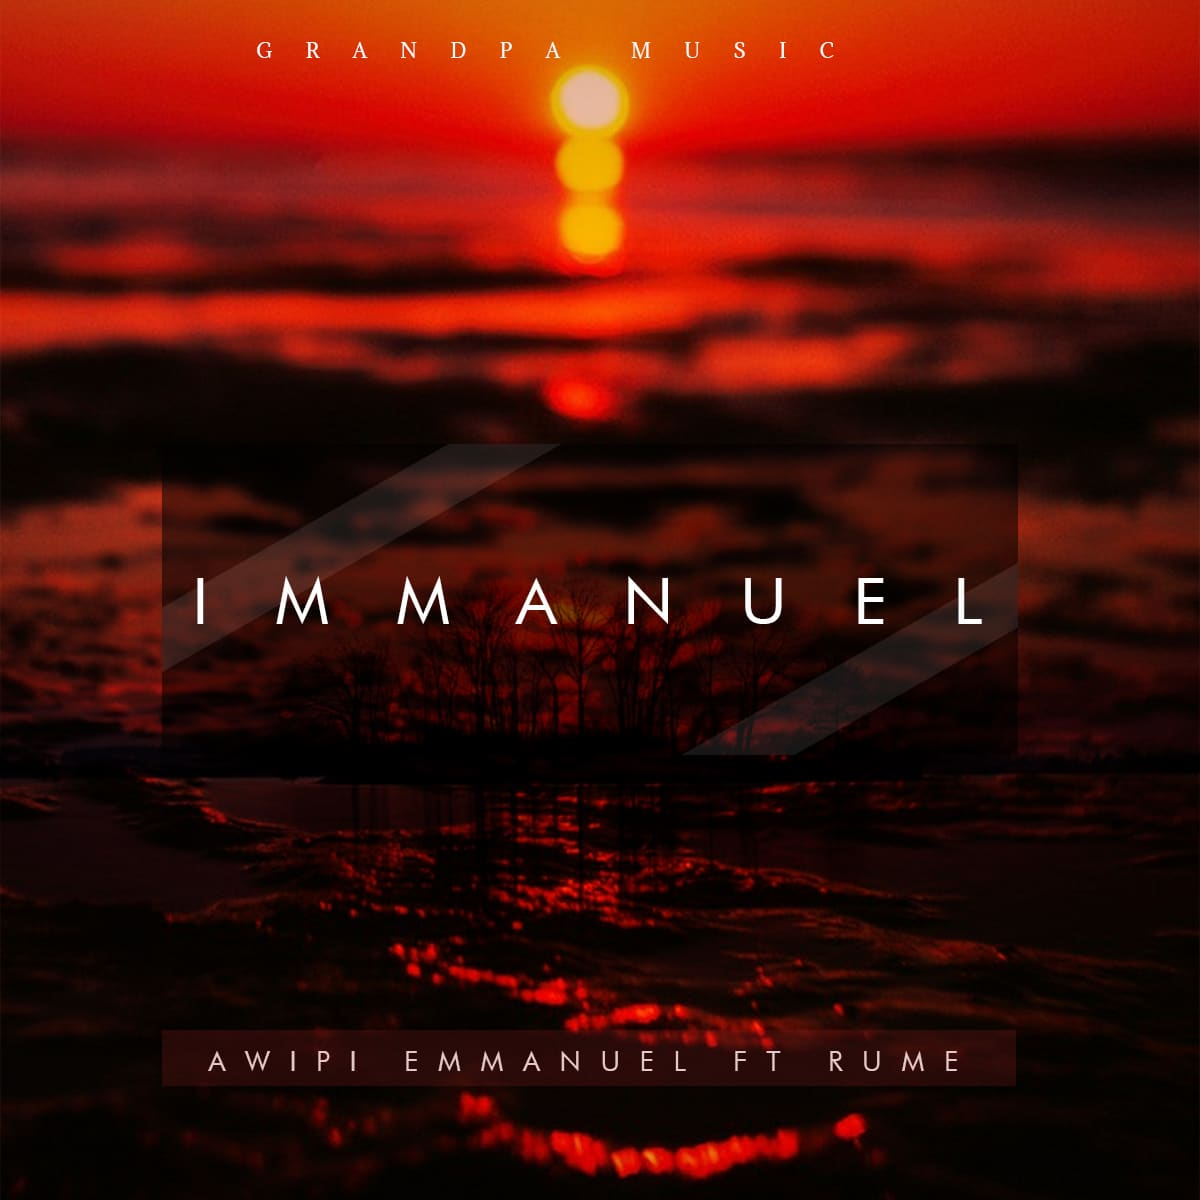 Awipi Emmanuel - Immanuel (ft. Rume)